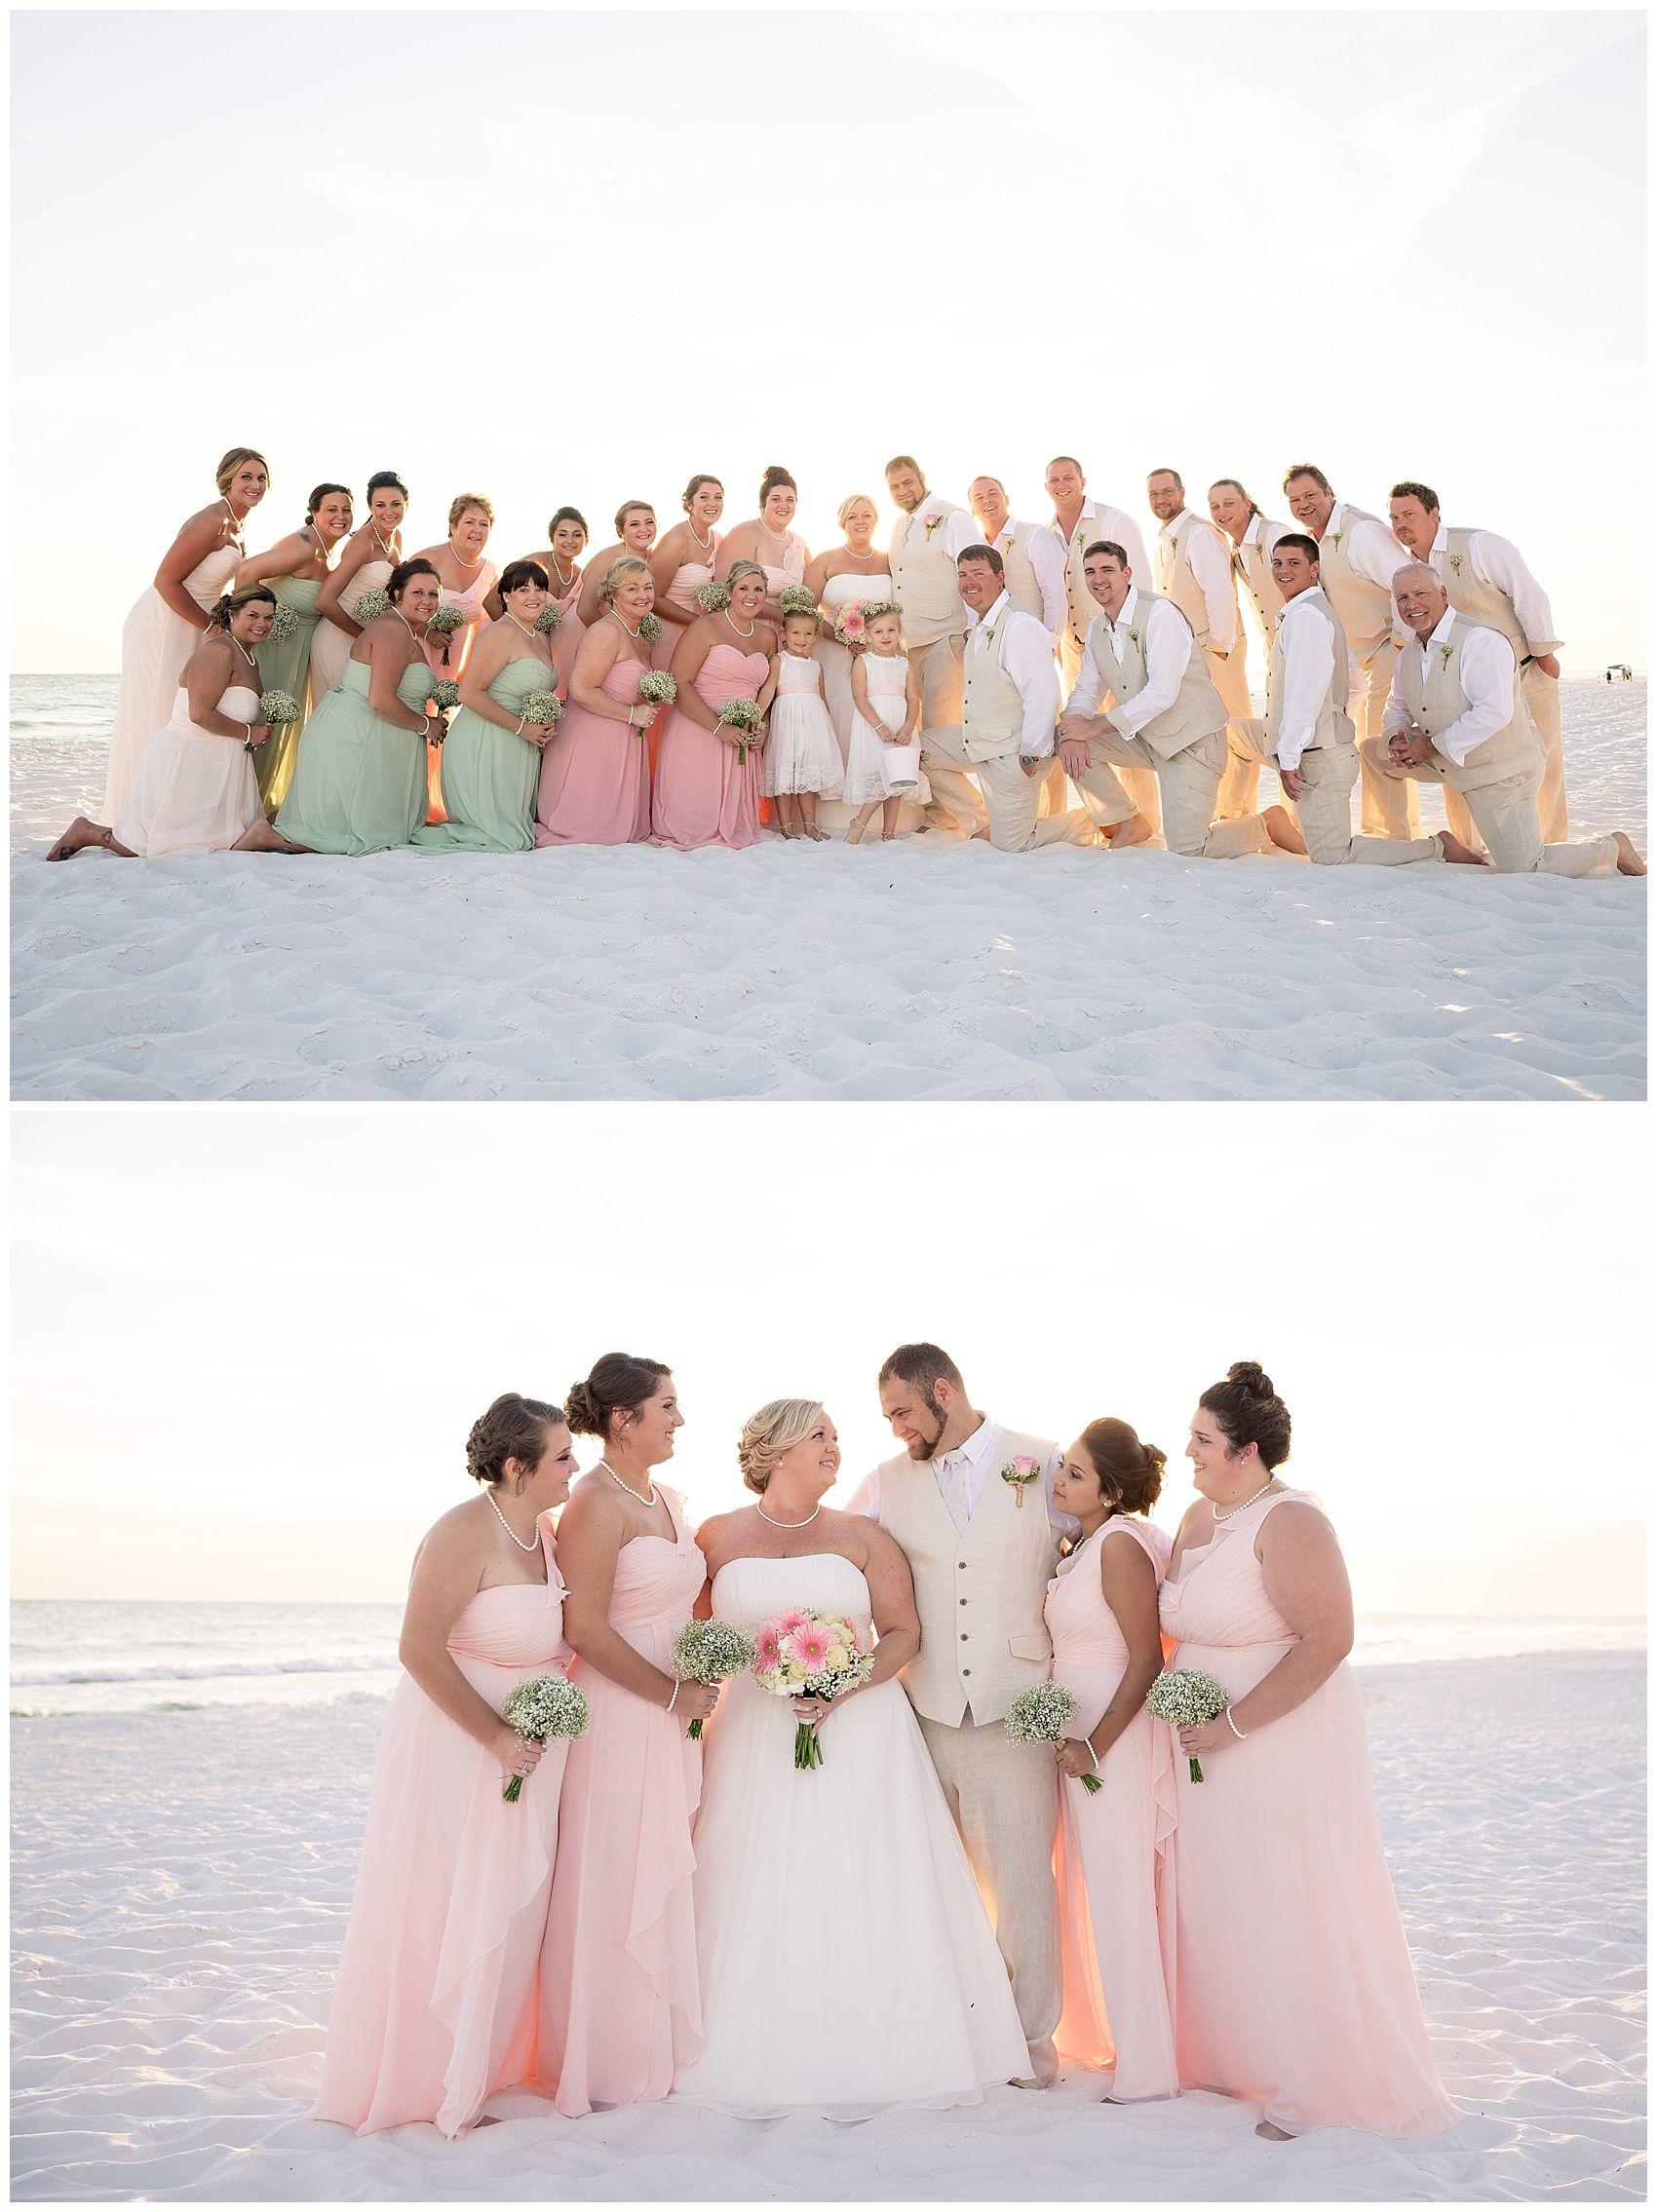 Wedding beach house  Alotta Colada Beach House Wedding  Wedding linens Groomsmen suits